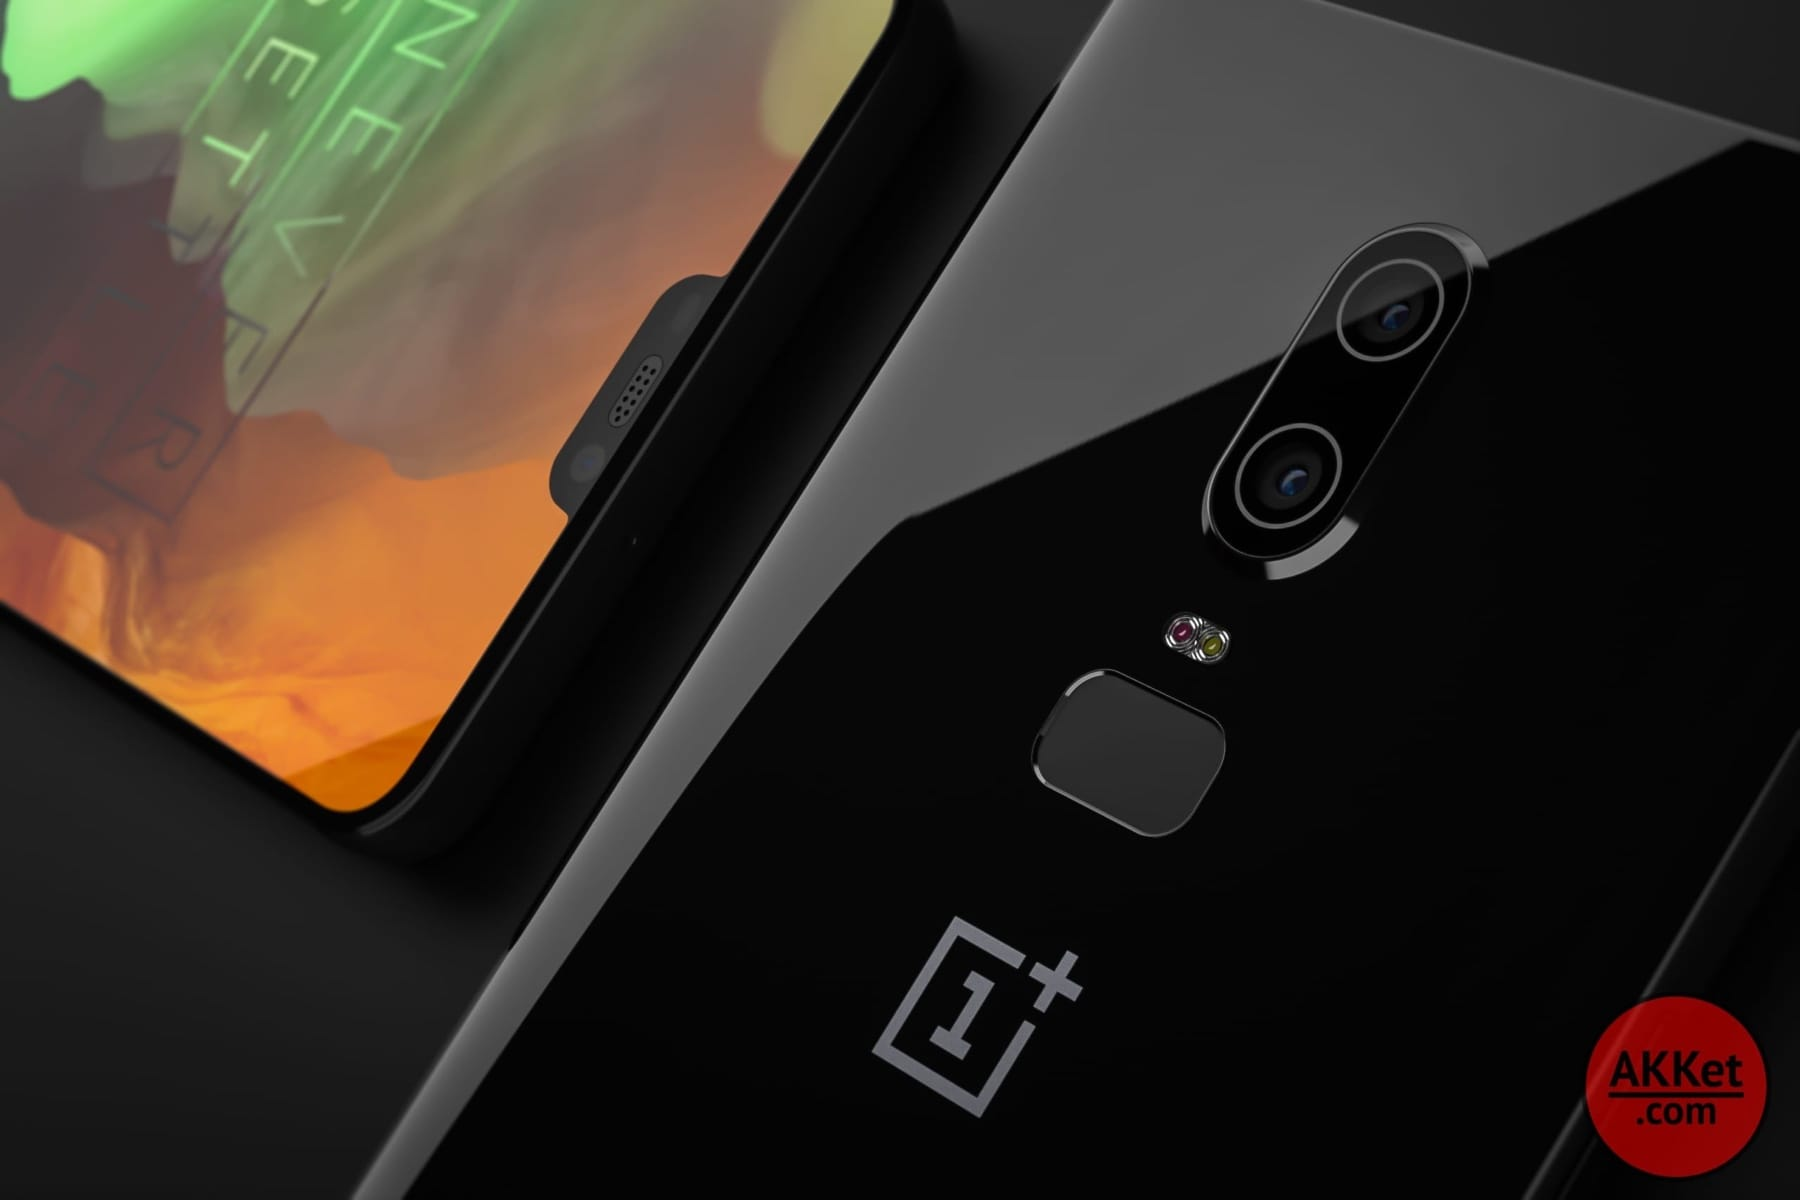 Смартфон OnePlus 6 снабдят стеклянным корпусом